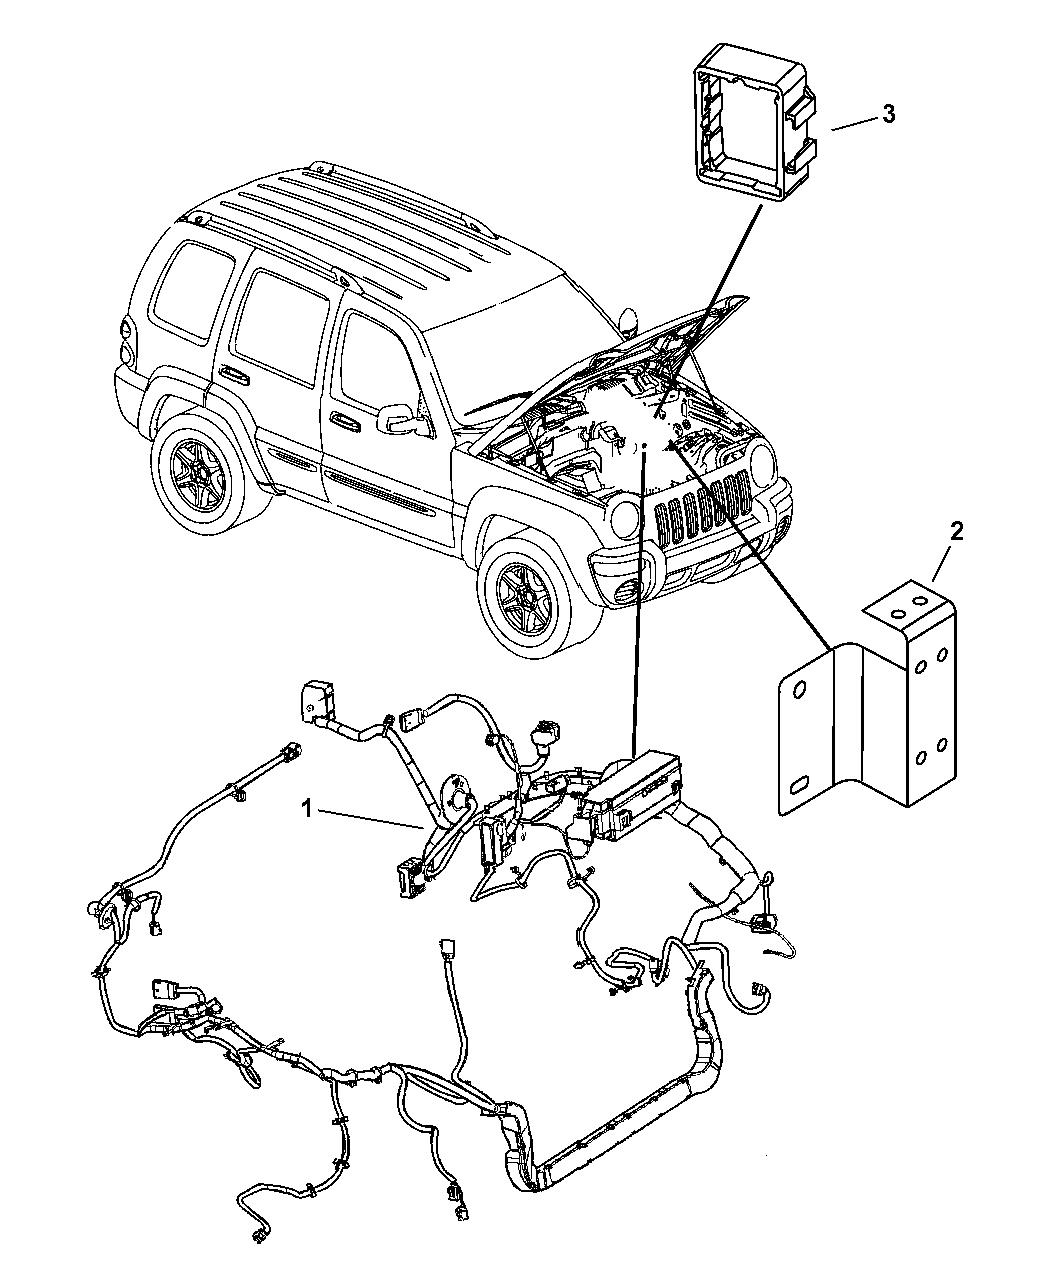 56047655ac Genuine Jeep Wiring Headlamp To Dash 2007 Headlight Diagram Liberty